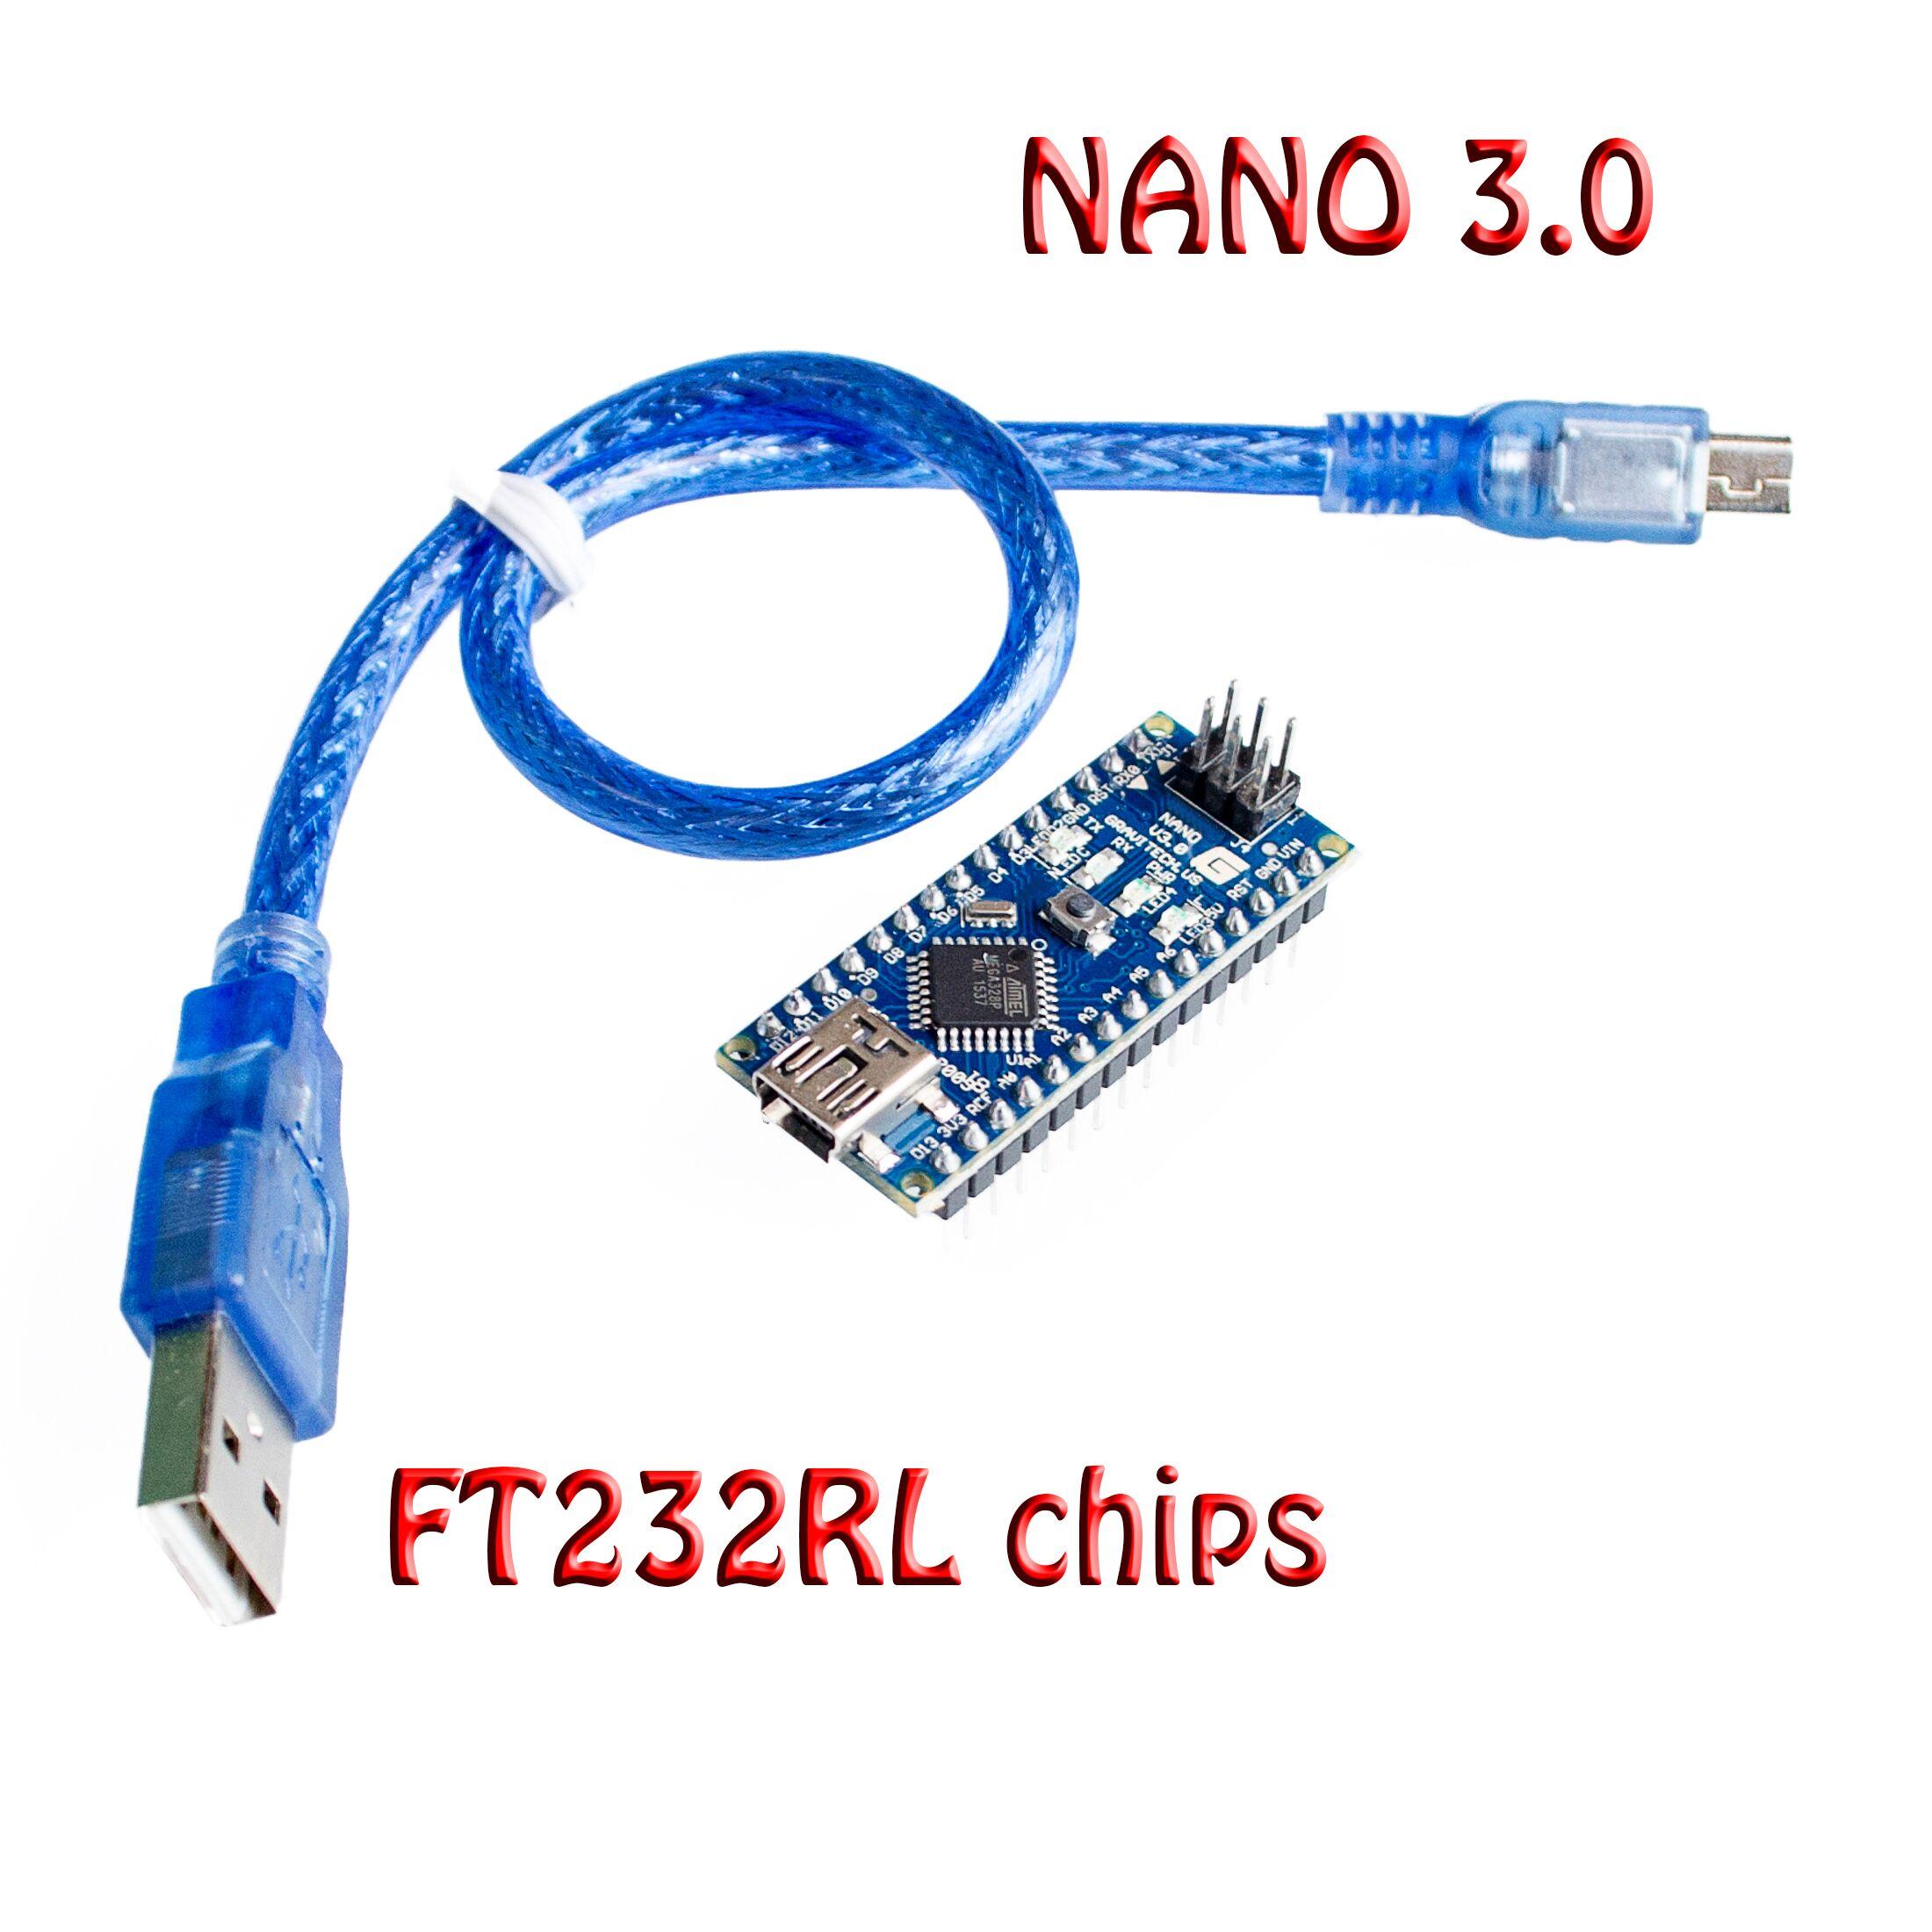 10set lot Original Nano 3 0 atmega328 mini version FT232RL imported chips support win7 Win8 for